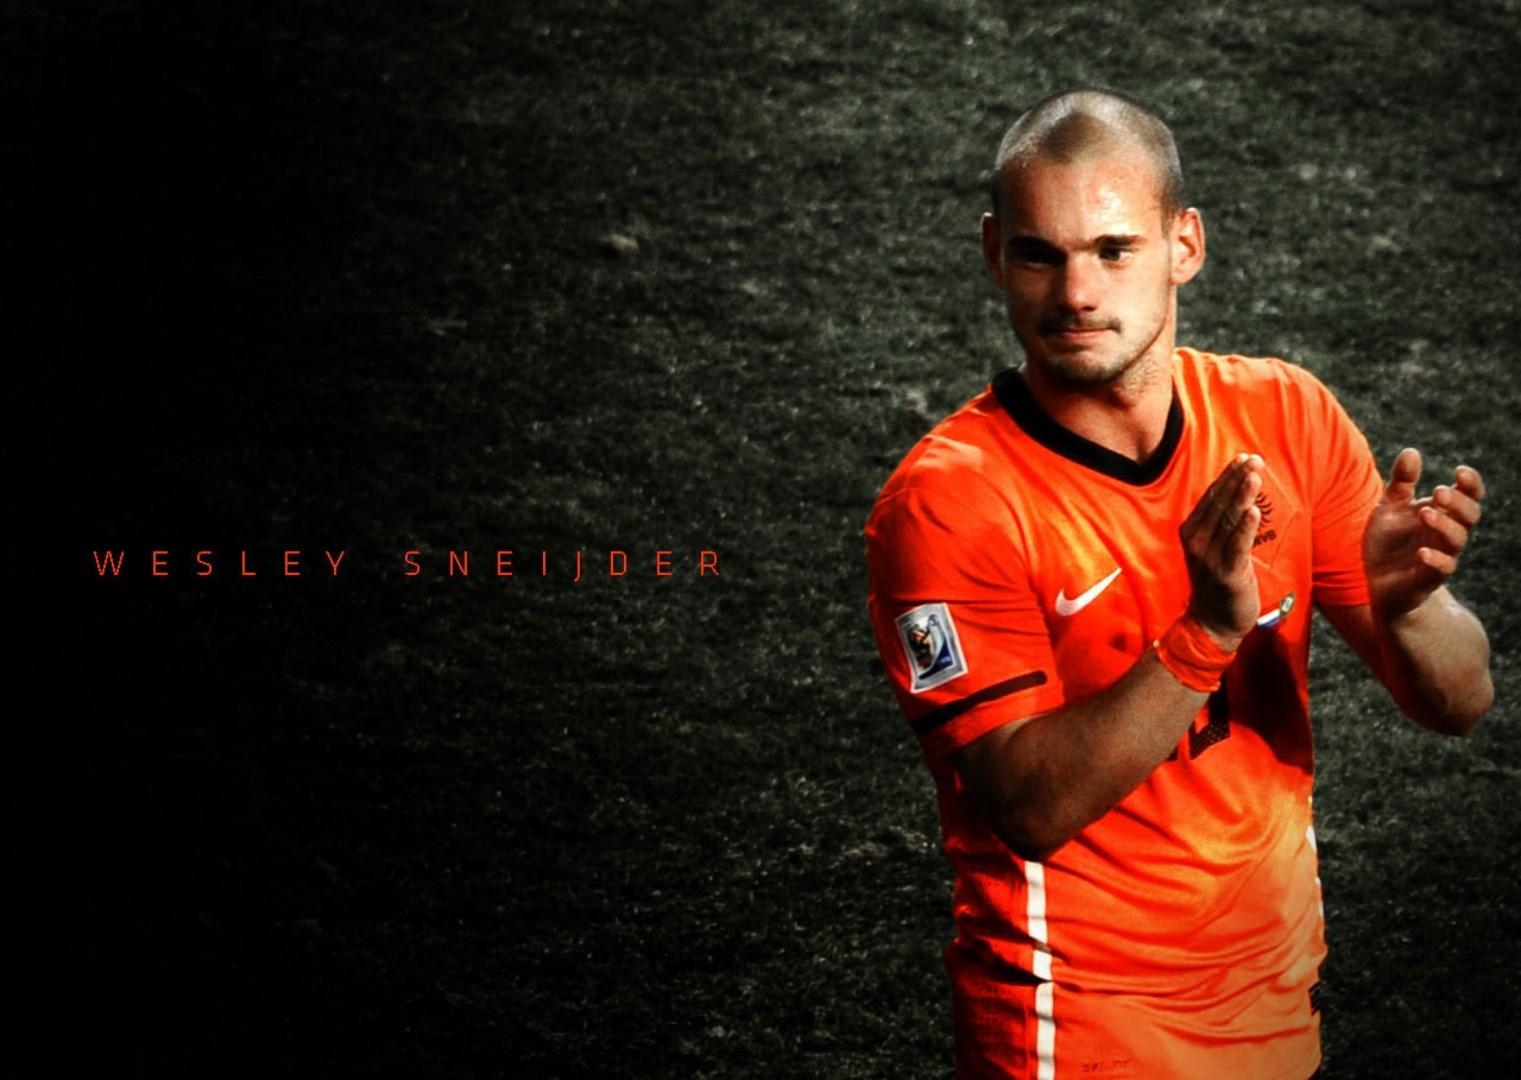 wesley+sneijder+galatasaray+resimleri+rooteto+16 Wesley Sneijder Galatasaray HD Resimleri